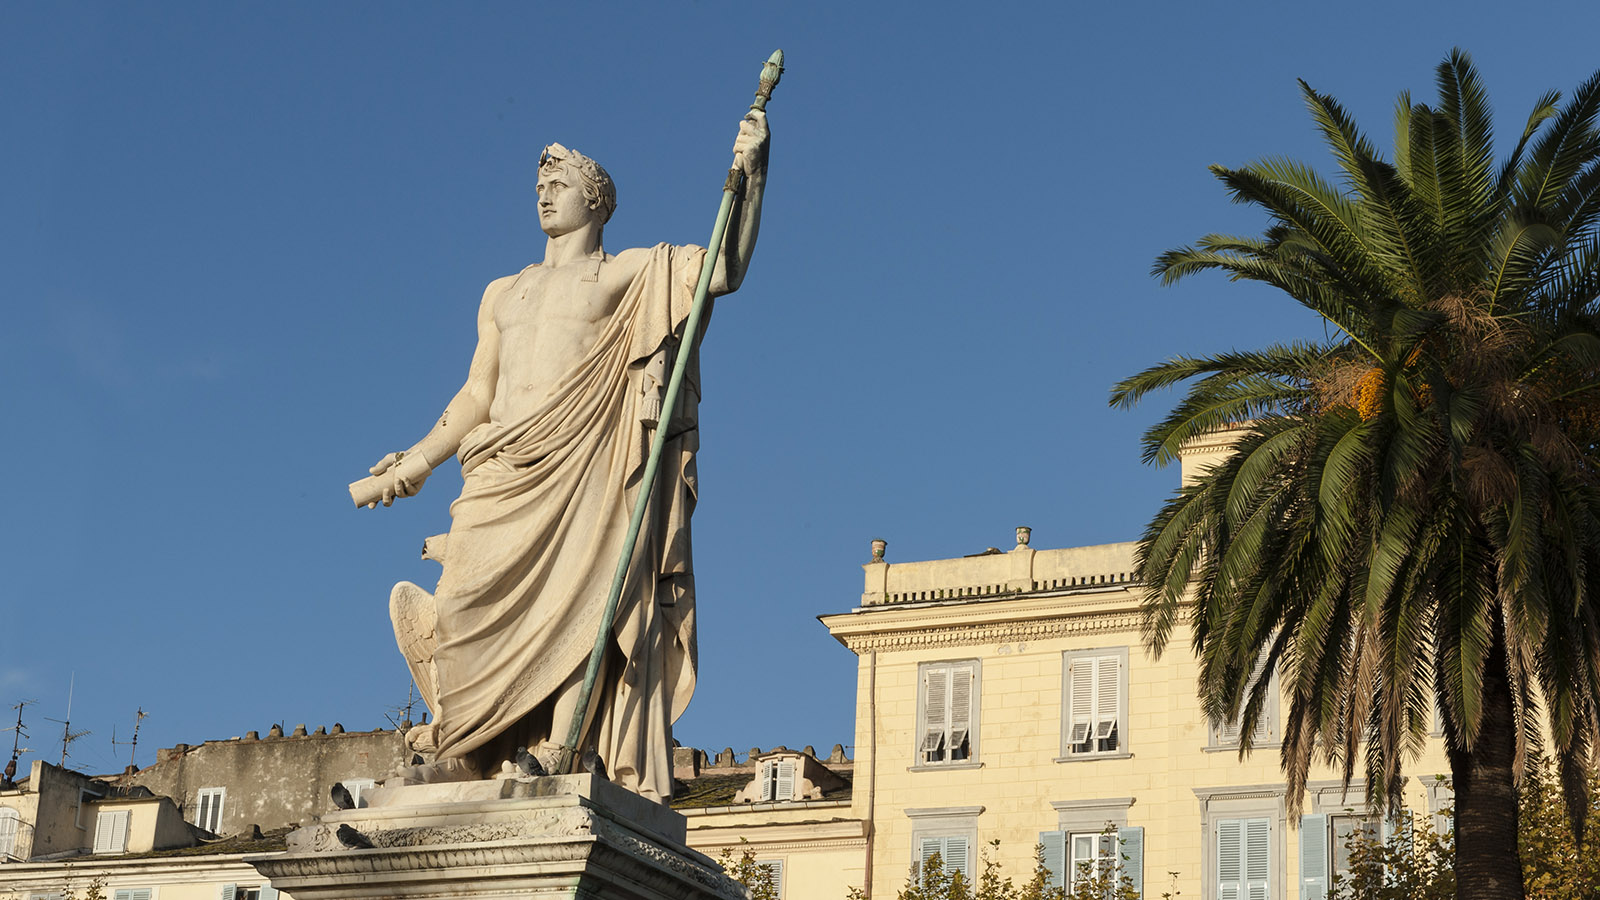 Bastia: Napoleon als römischer Imperator - das Kaiser-Denkmal